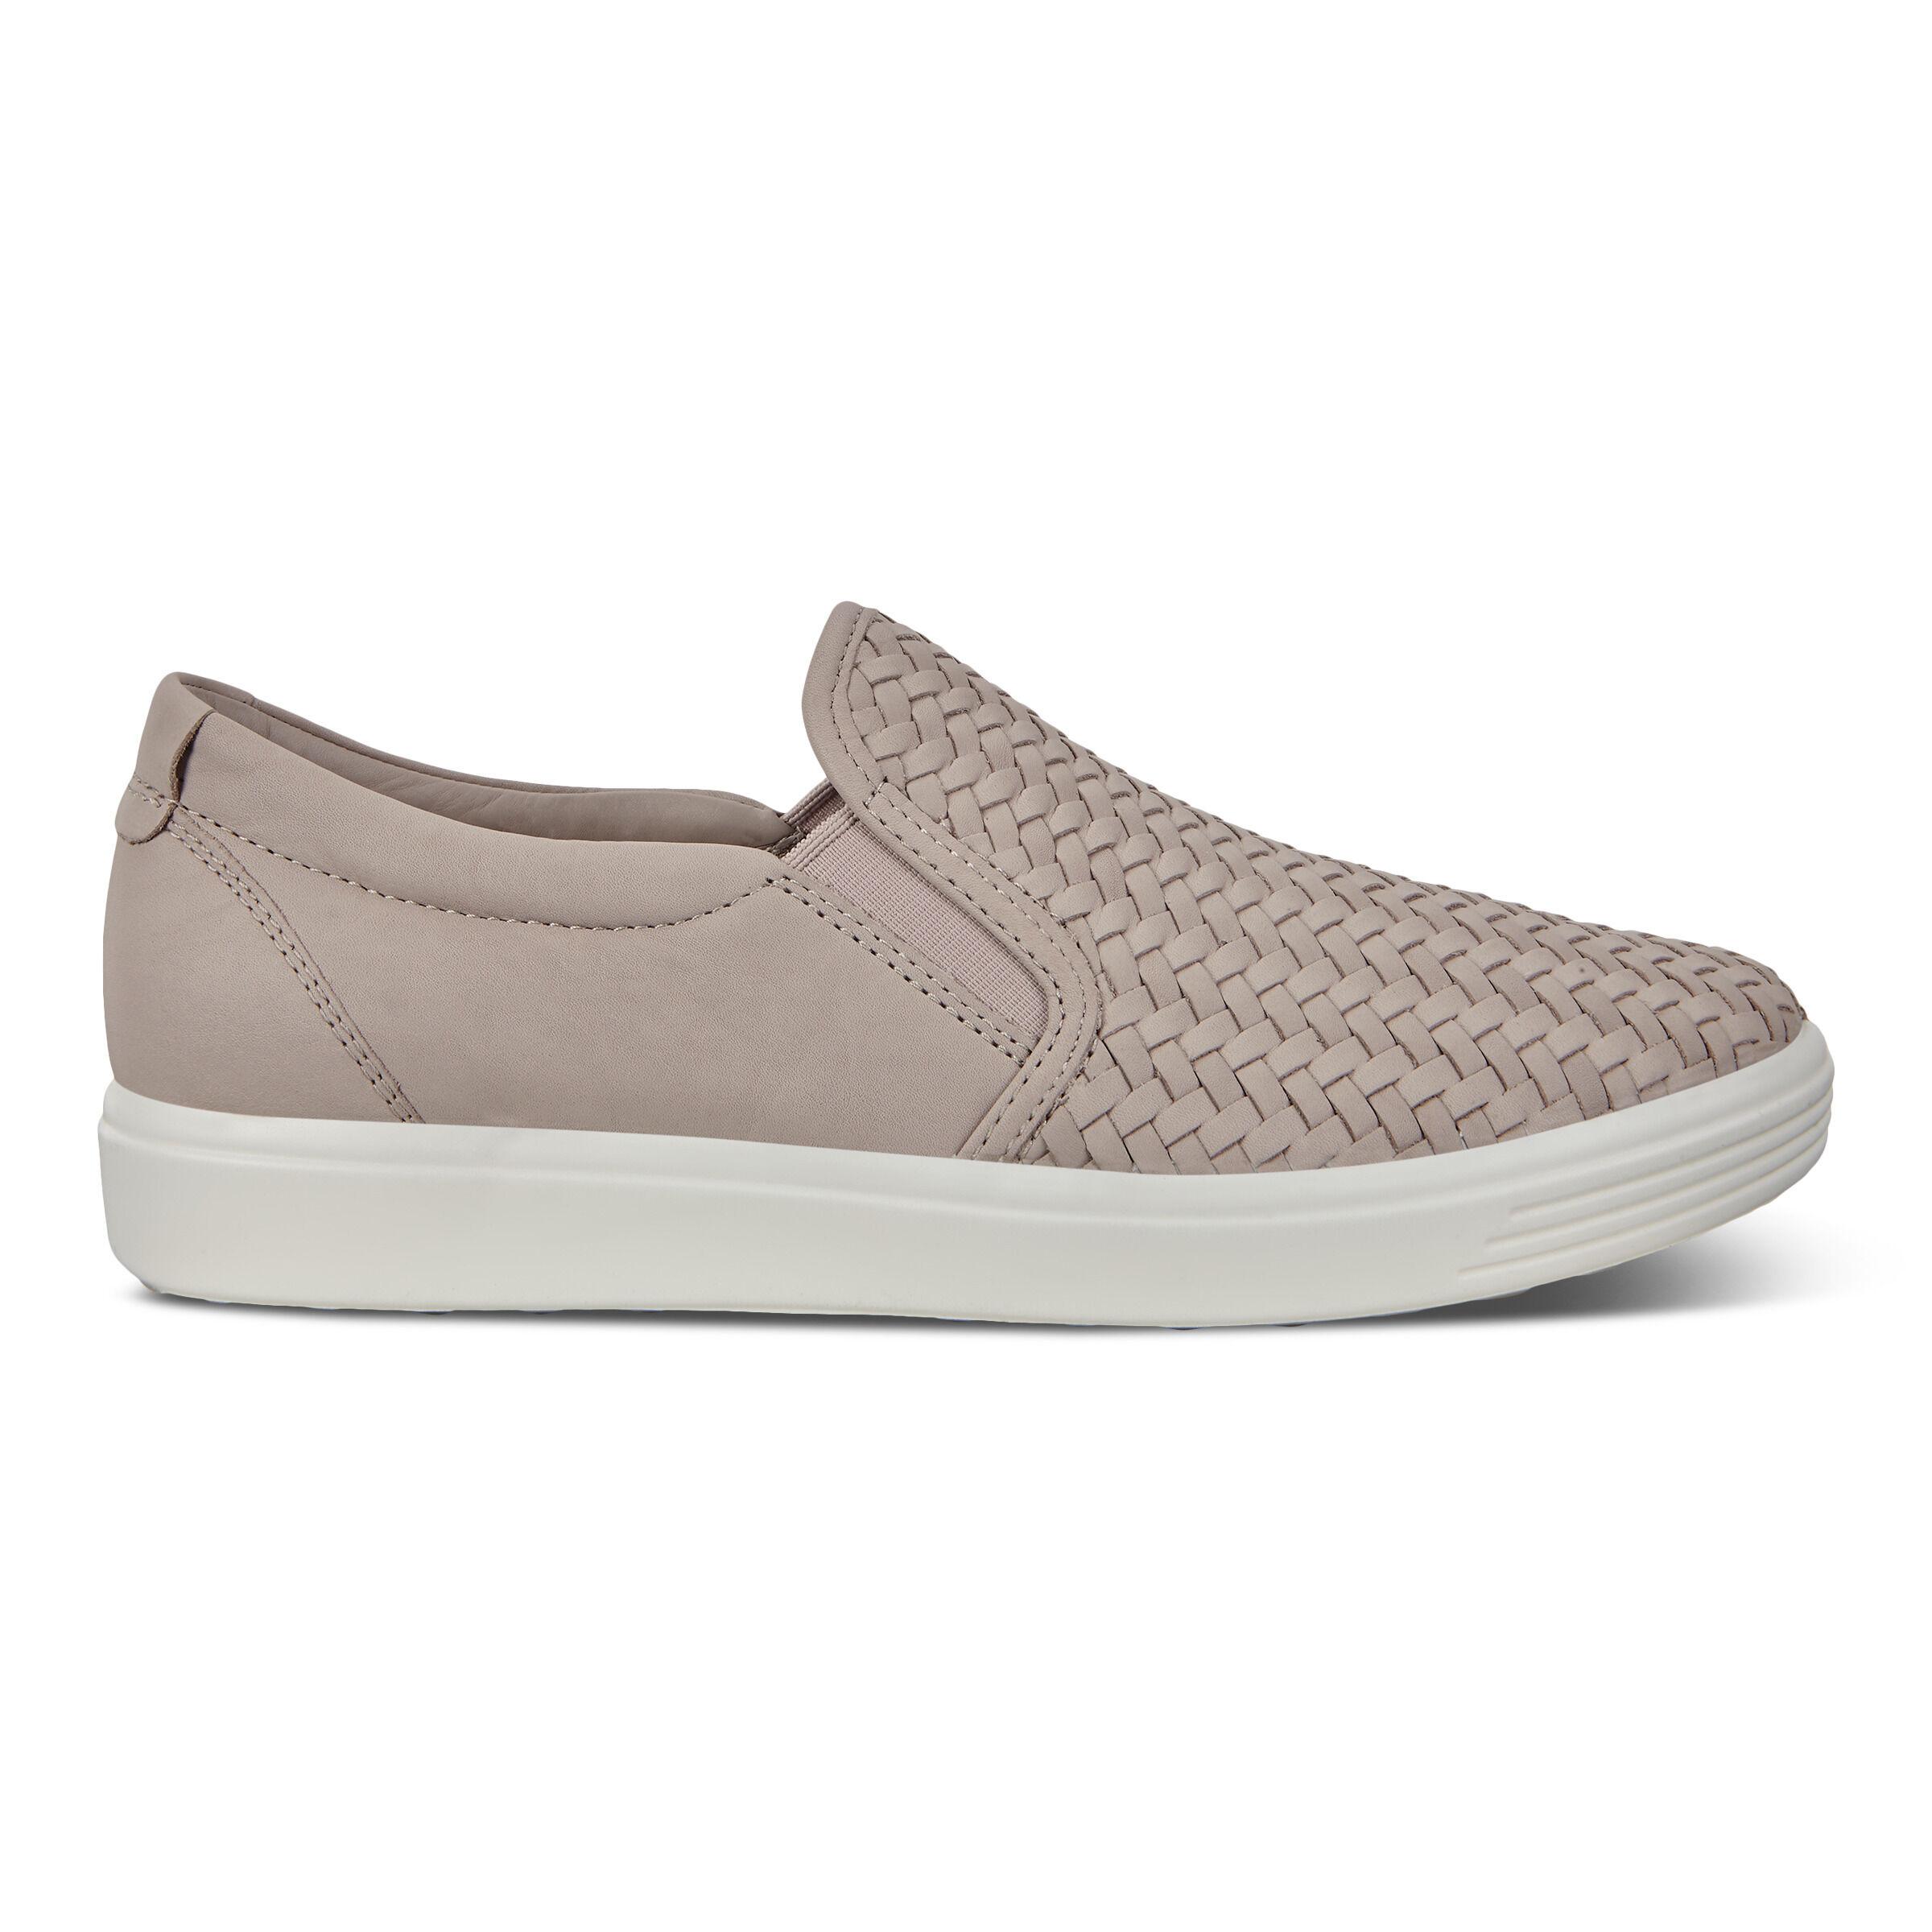 Women's Sneakers | ECCO® Shoes